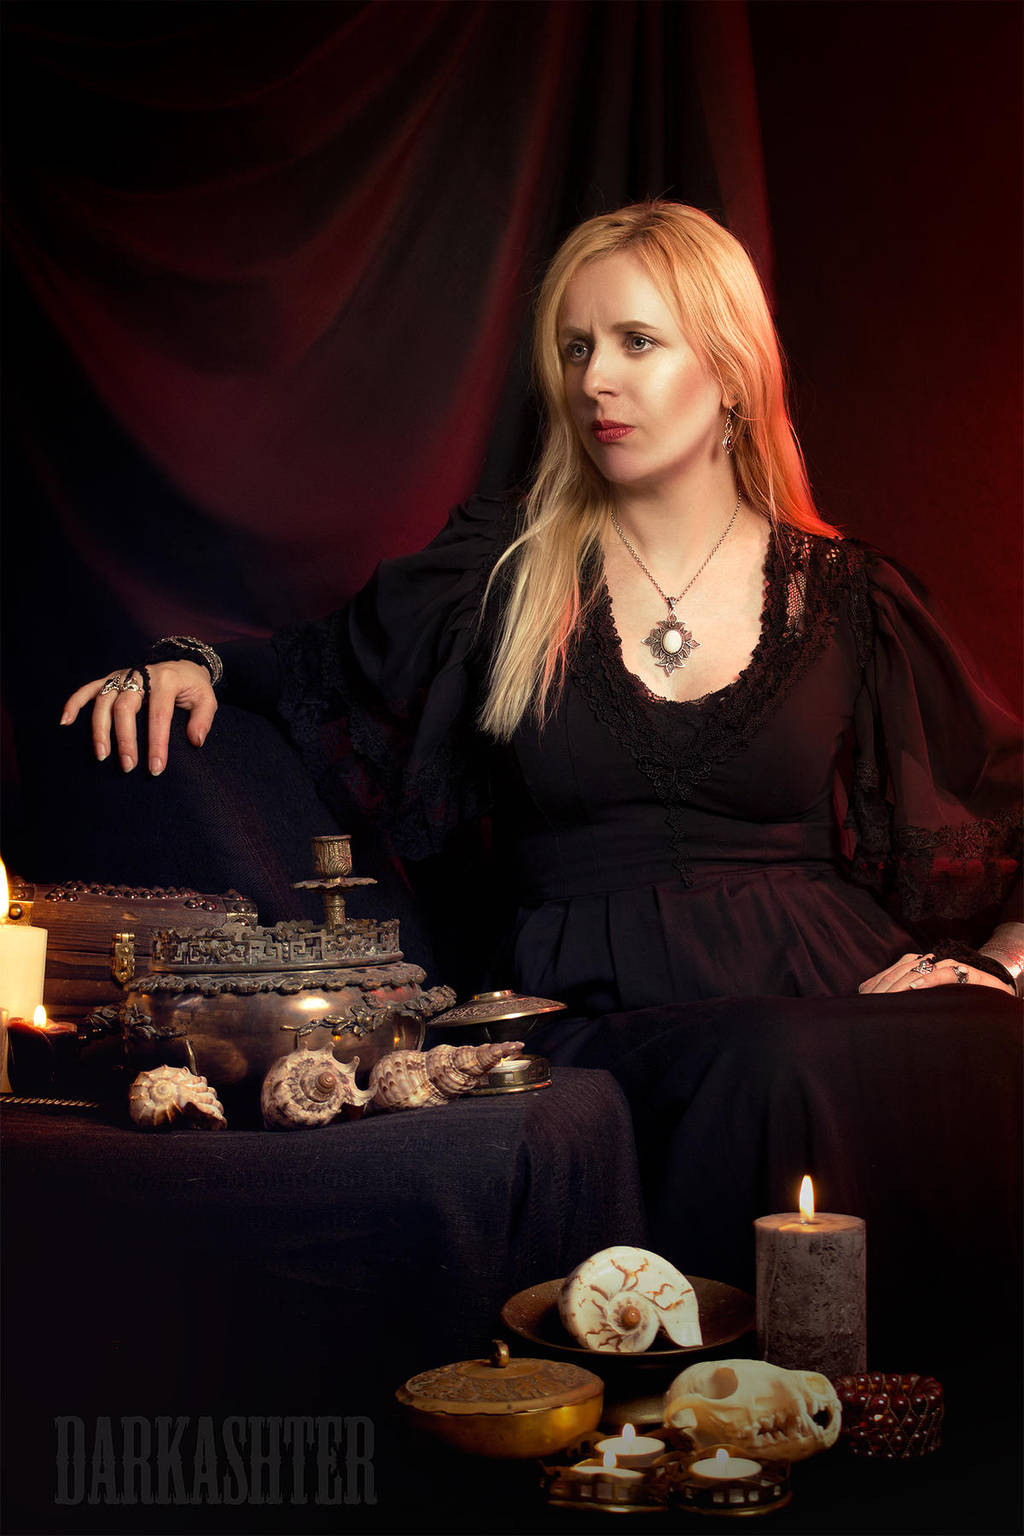 Good Witch by Vanderstorme